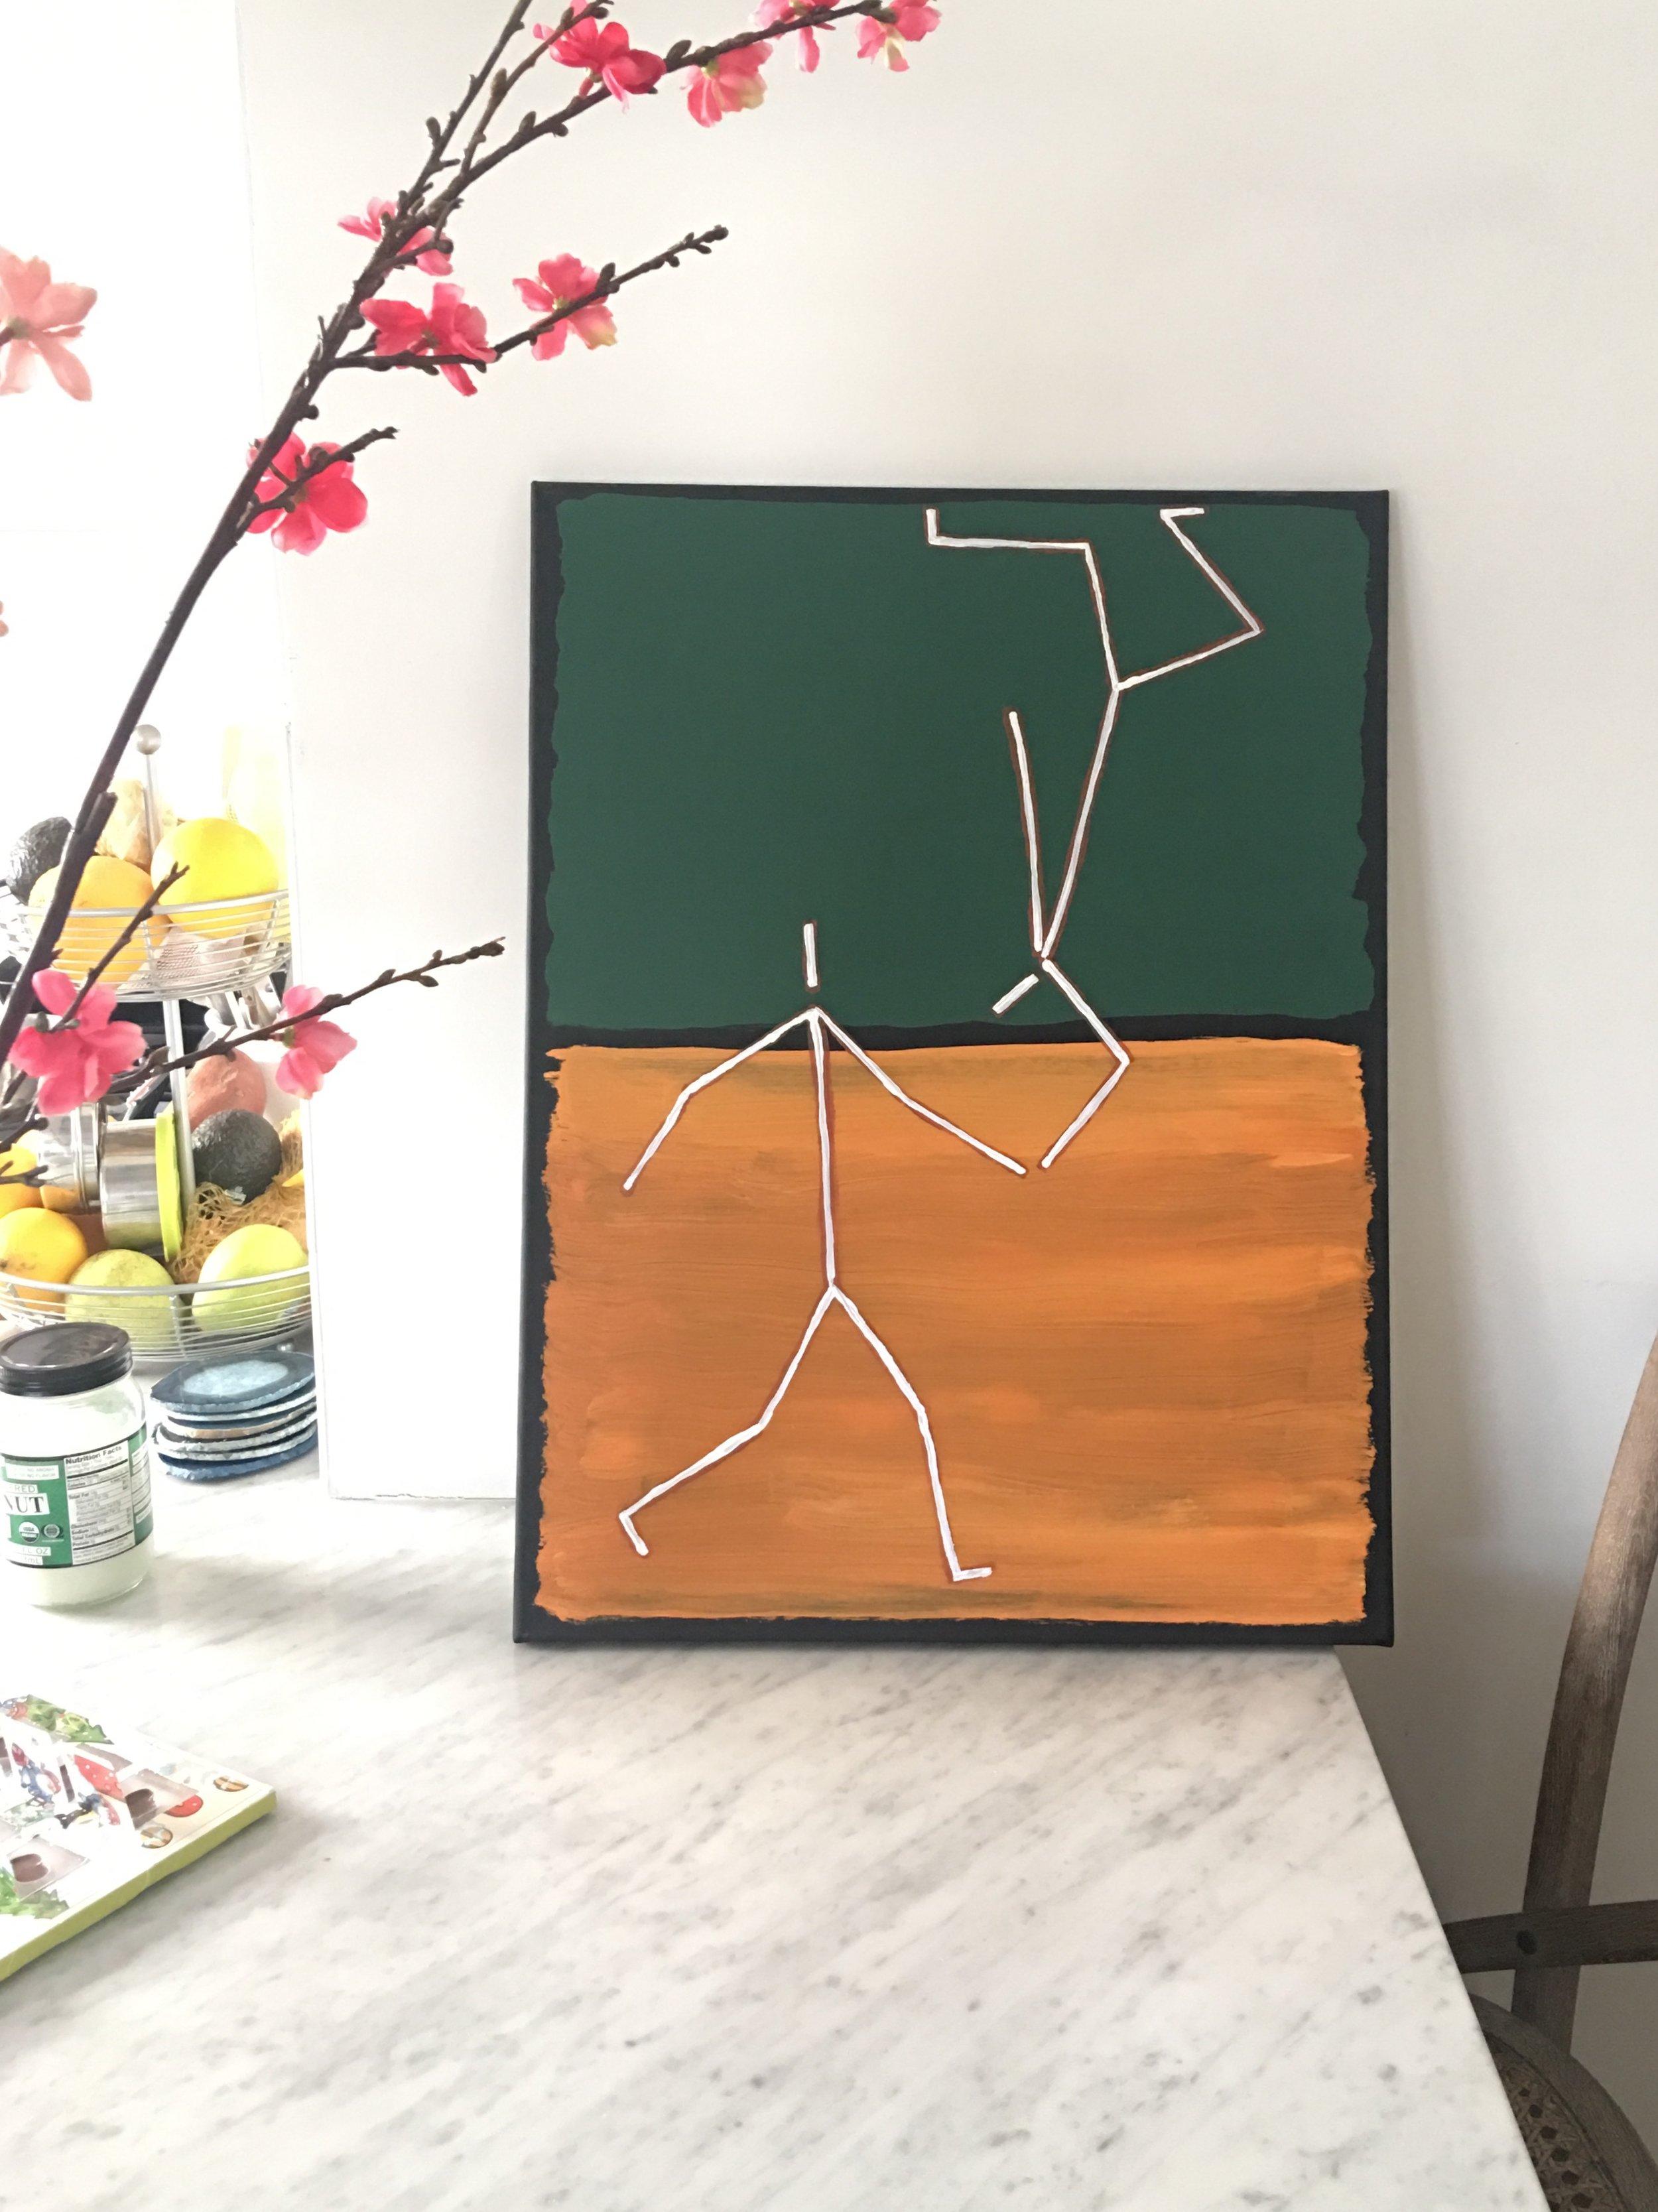 The Catch - Acrylic on Canvas